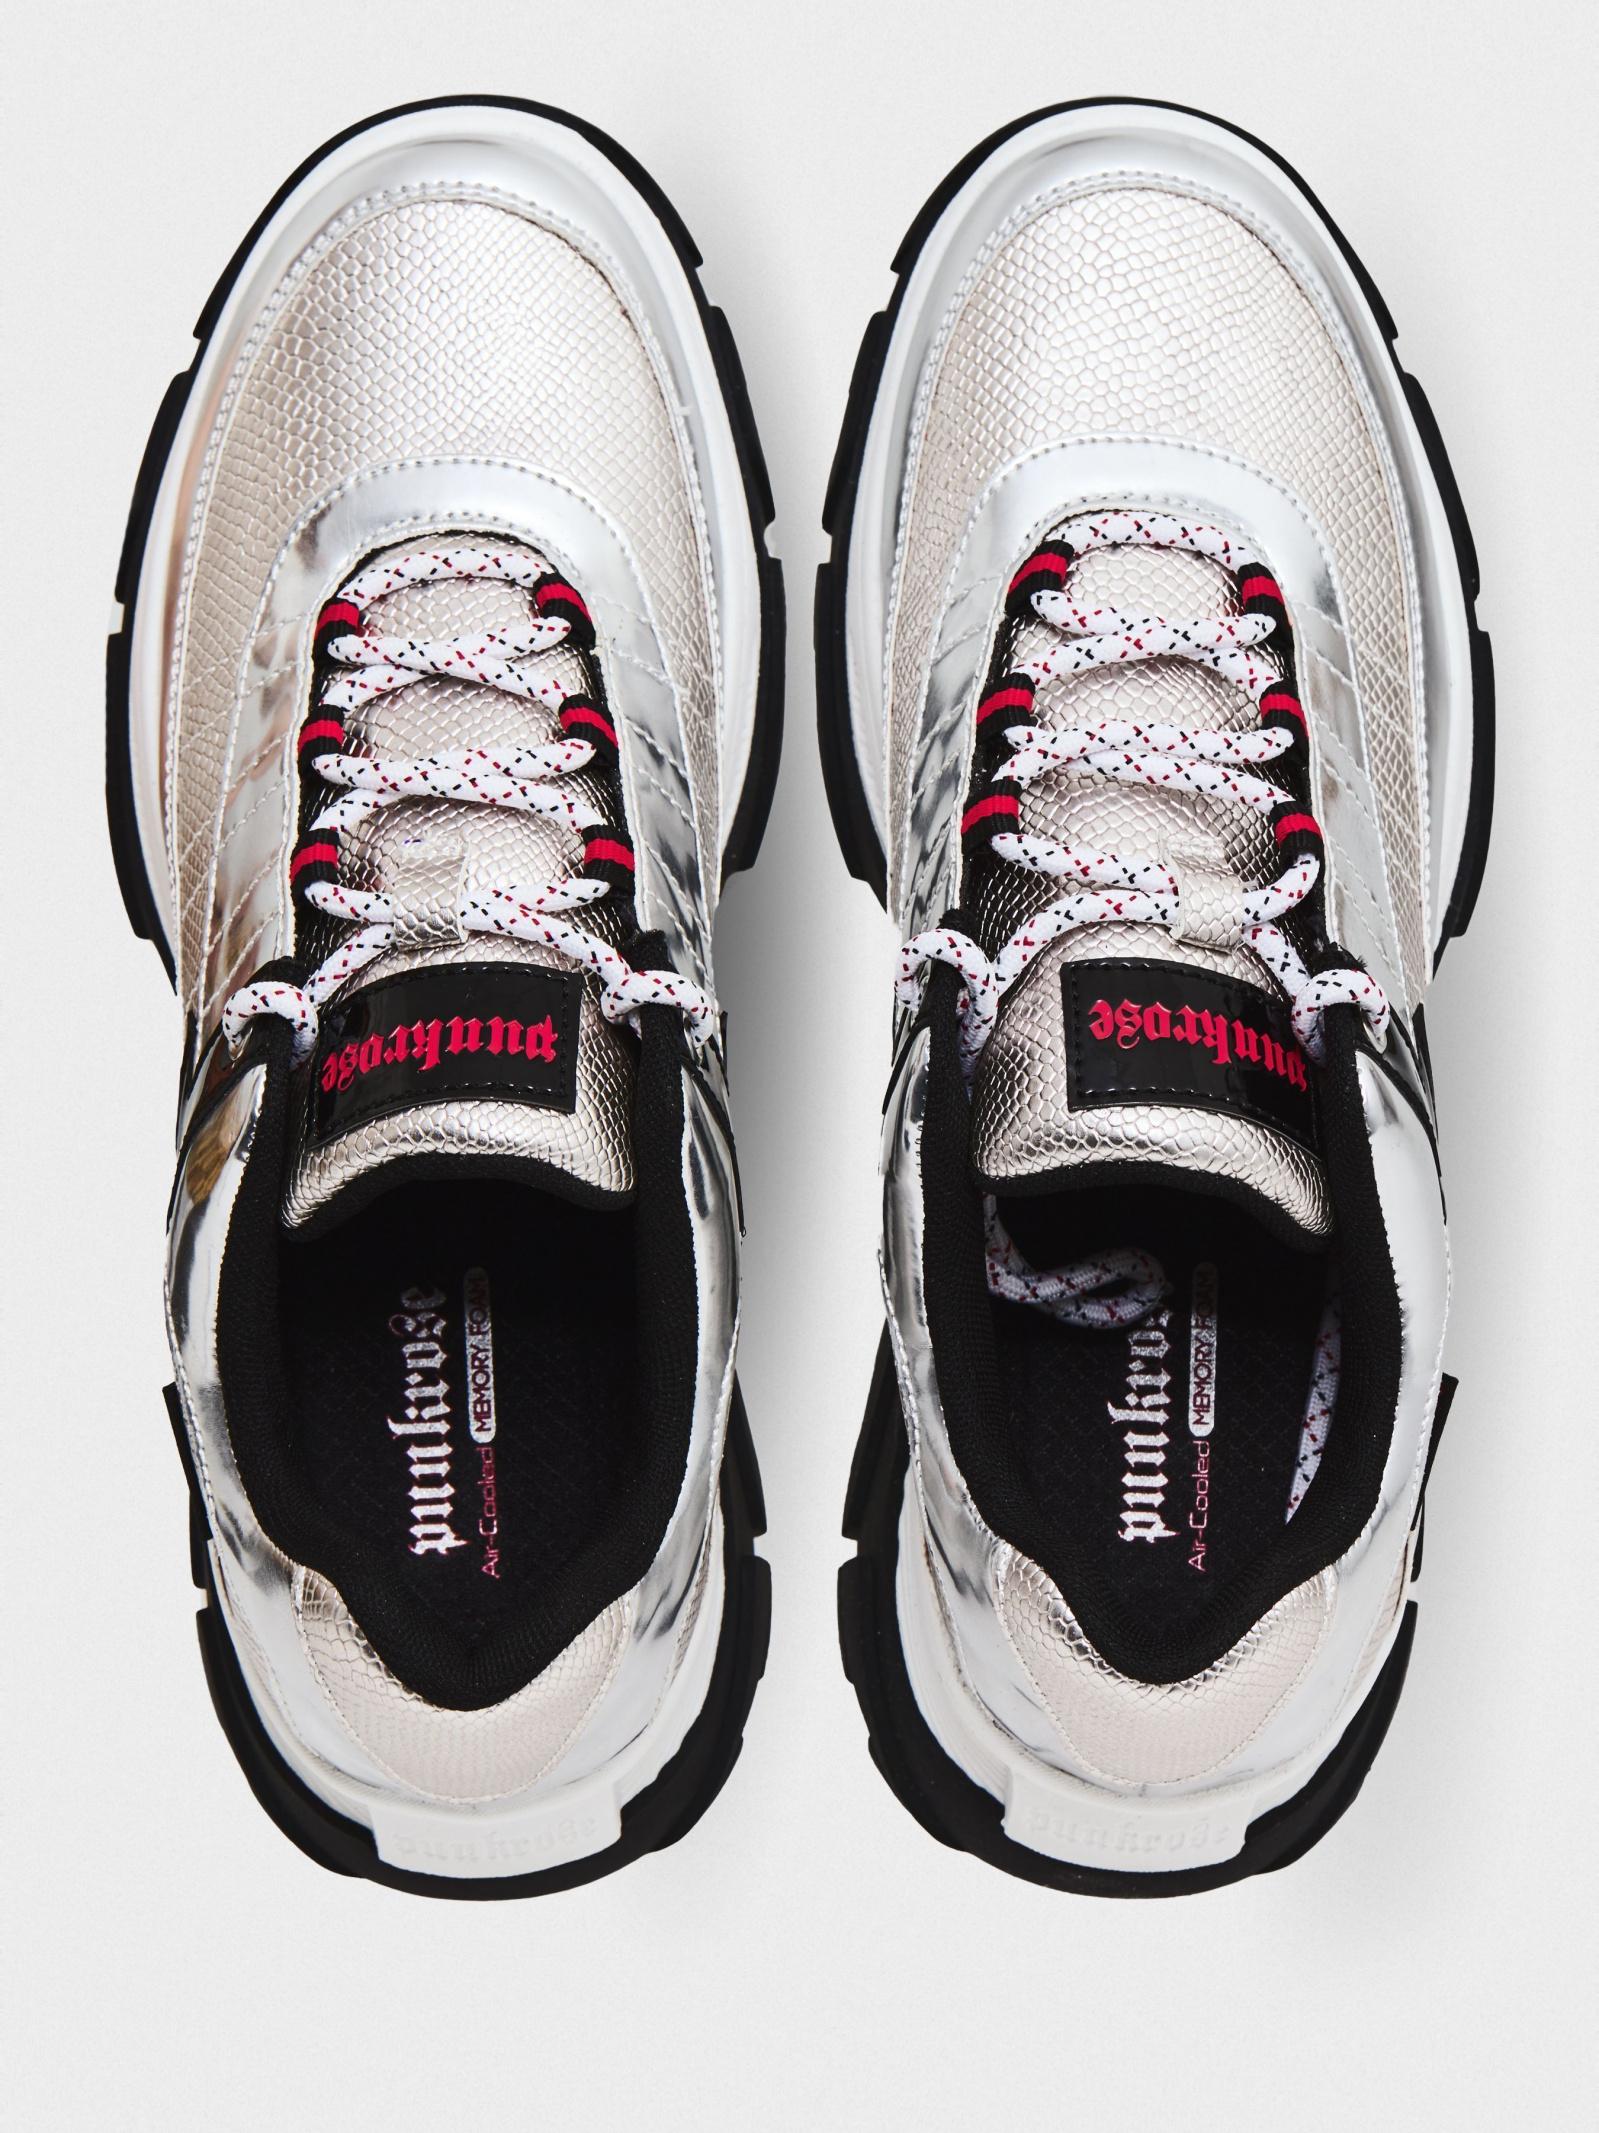 Кроссовки для женщин Skechers Street 148001 SIL фото, купить, 2017